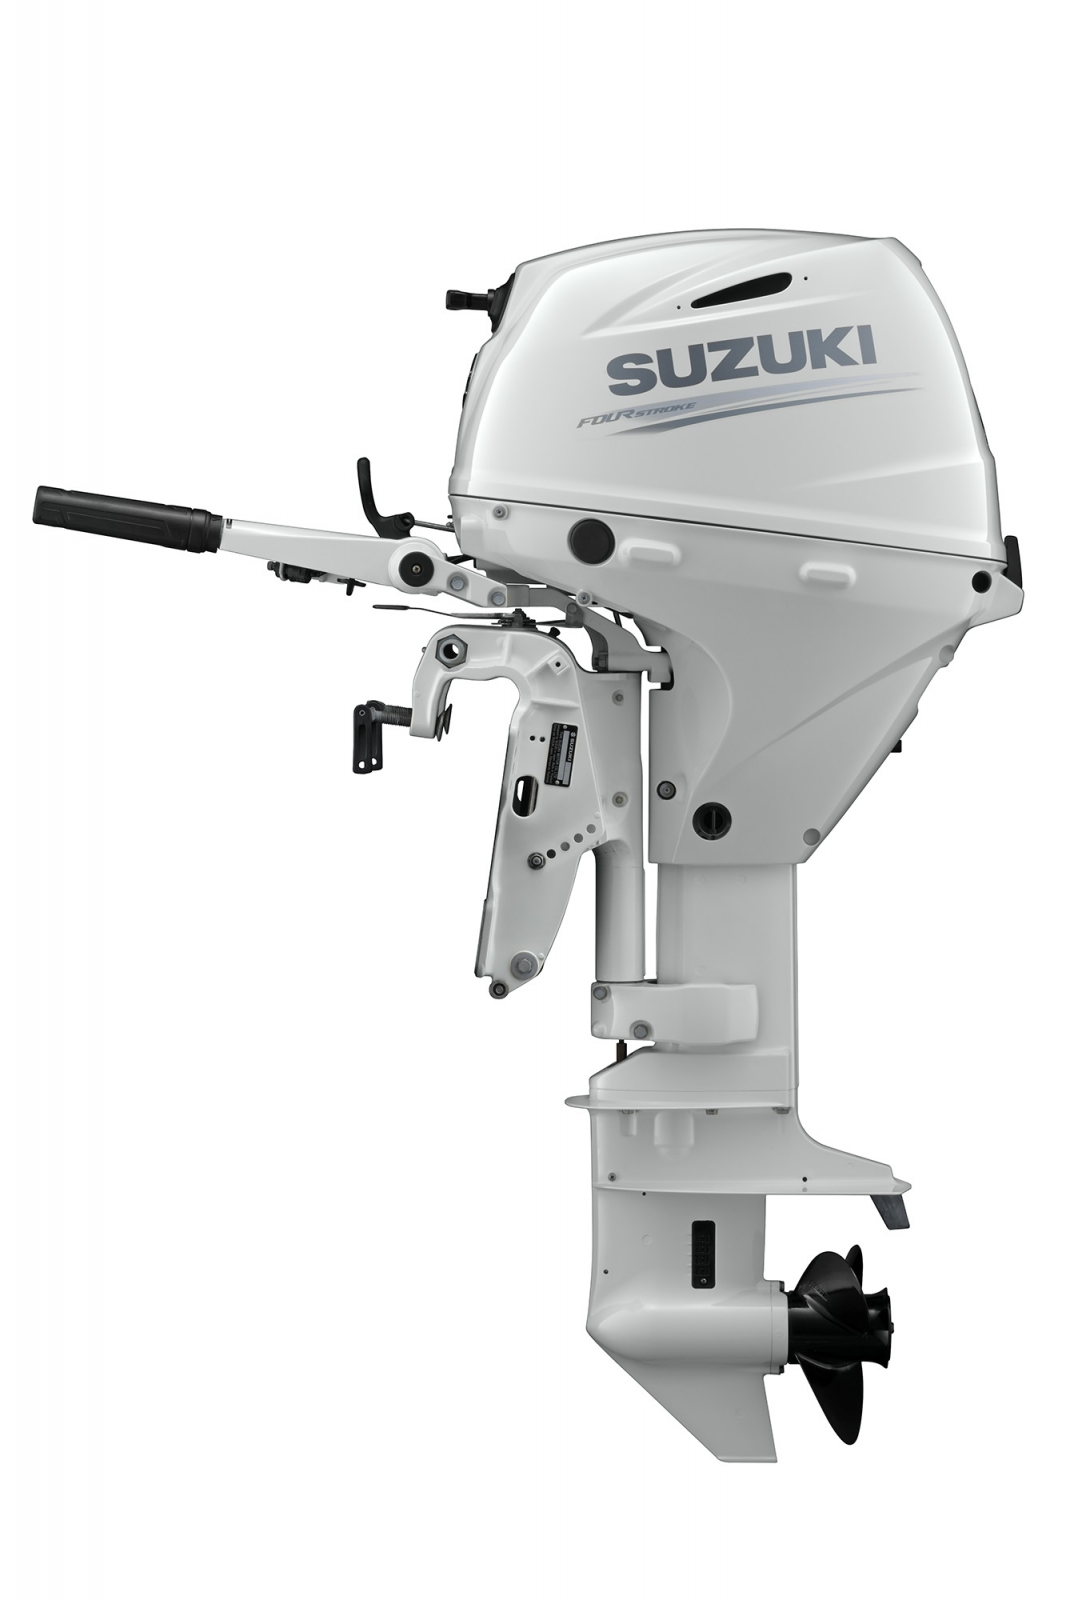 Modern Classroom Recorder By Suzuki ~ Suzuki announces even more additions to its outboard line